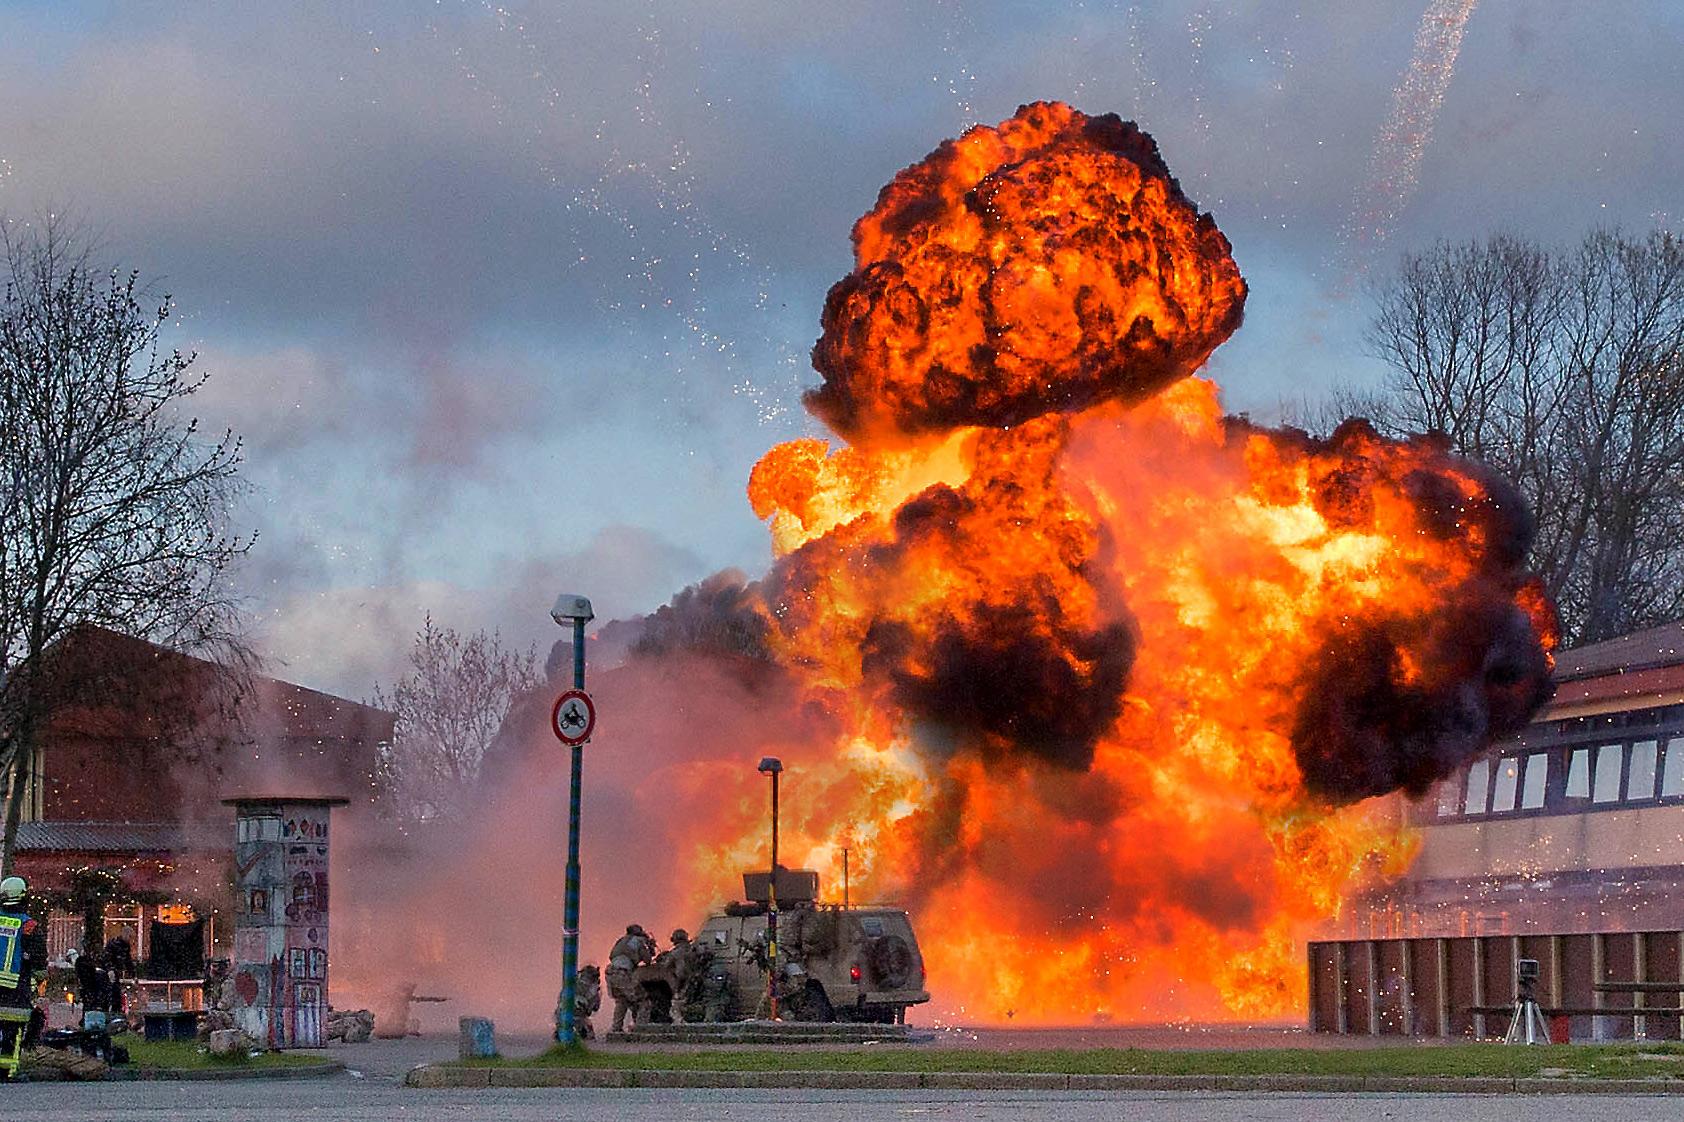 MG Action, Martin Goeres, SpecialForeces, NavySeals, Under Fire